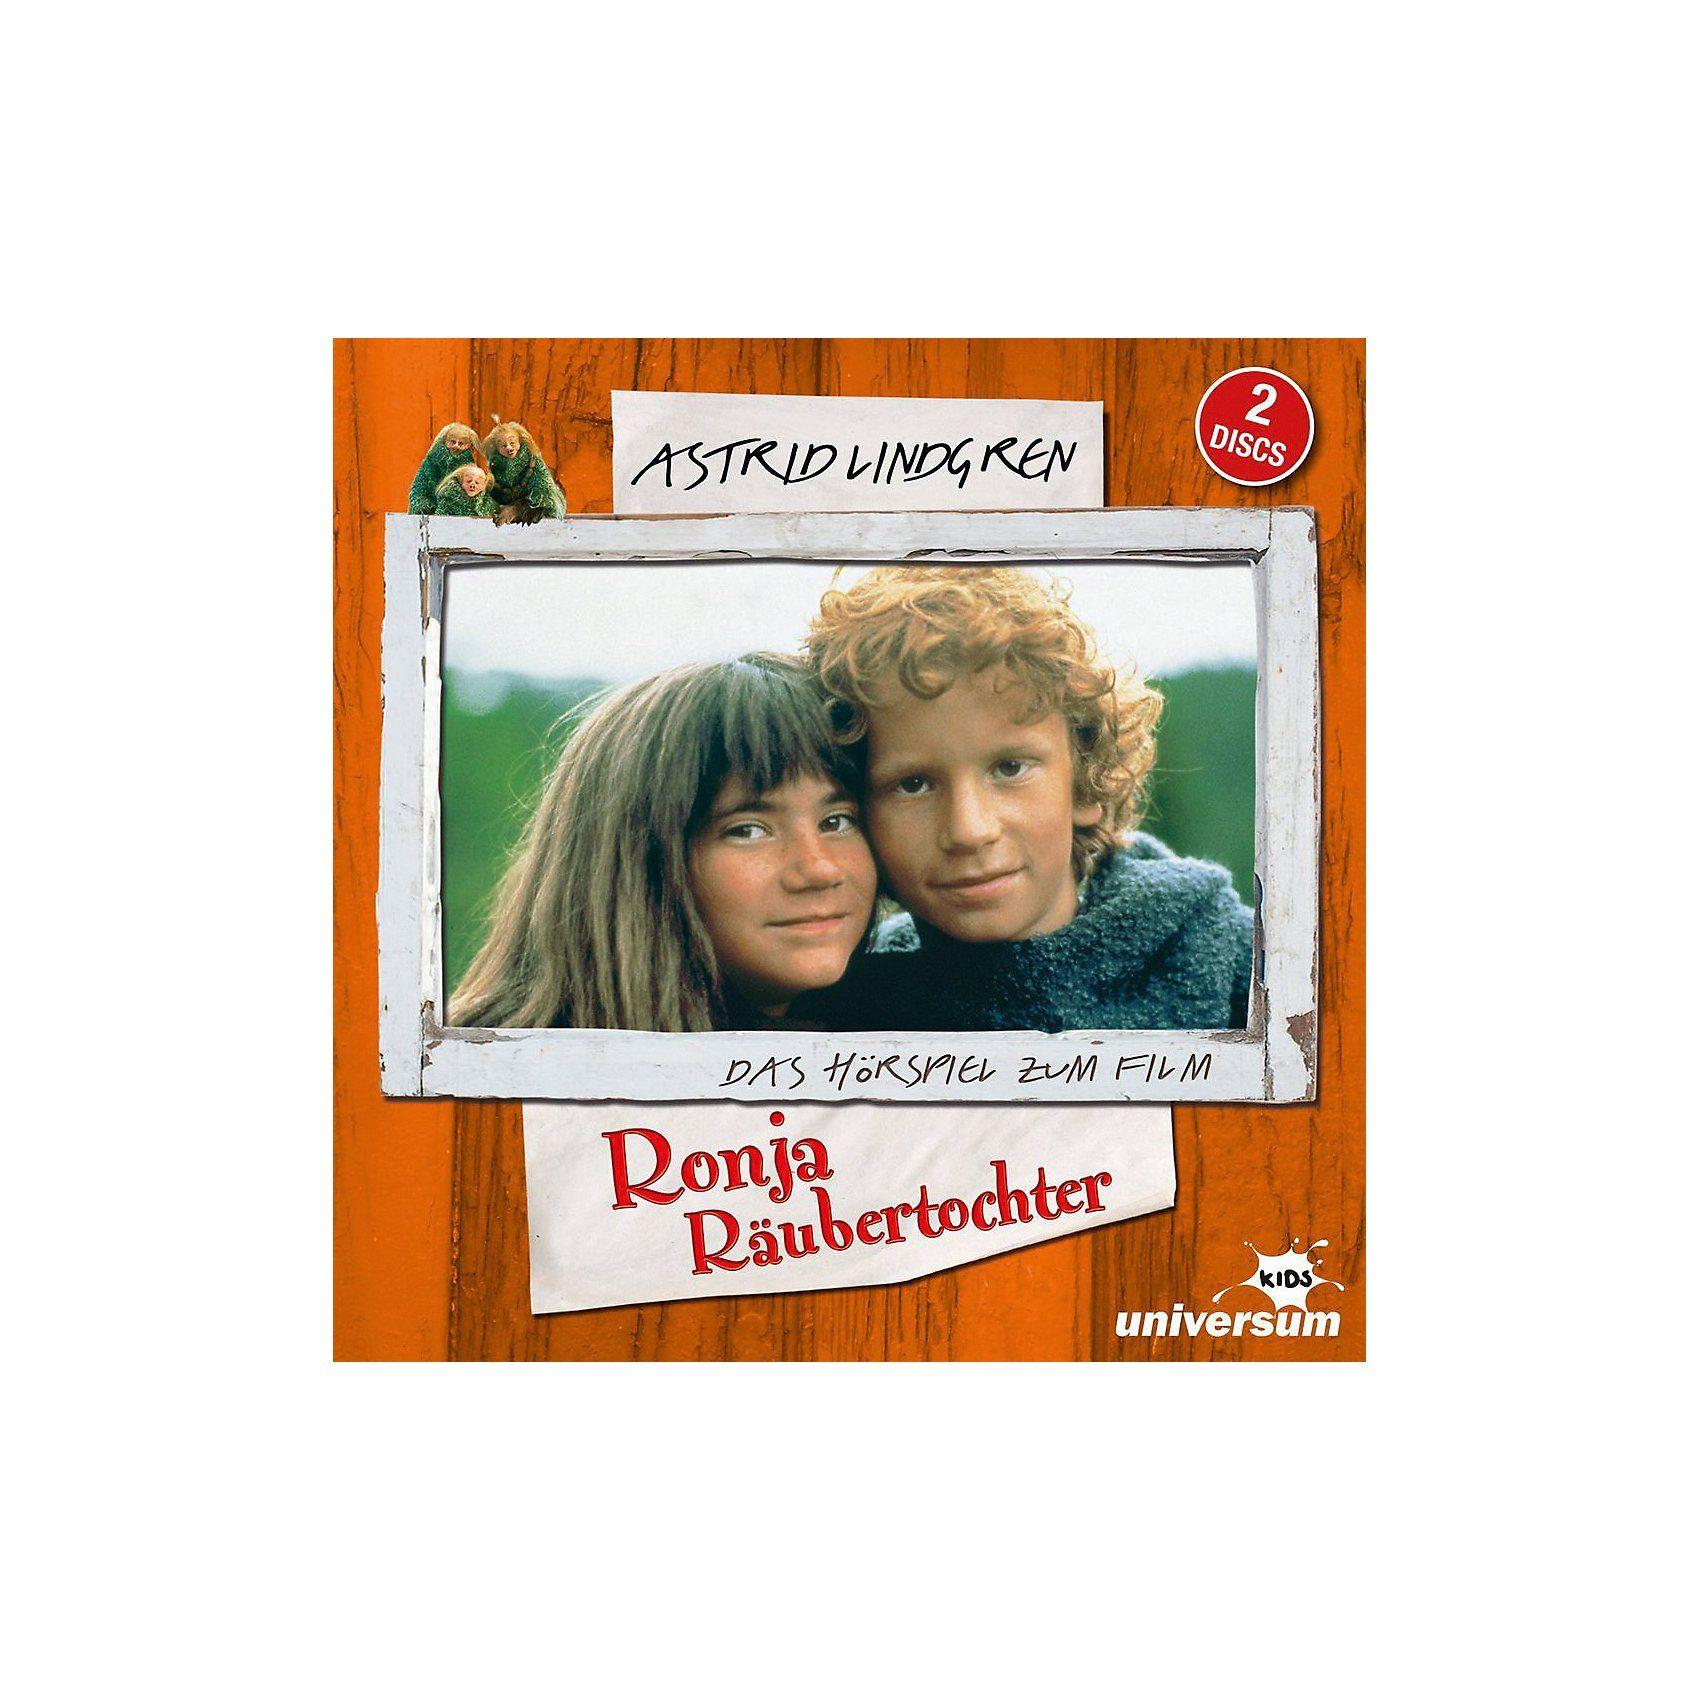 Universum CD Astrid Lindgren - Ronja Räubertochter (Hörspiel zum Film)